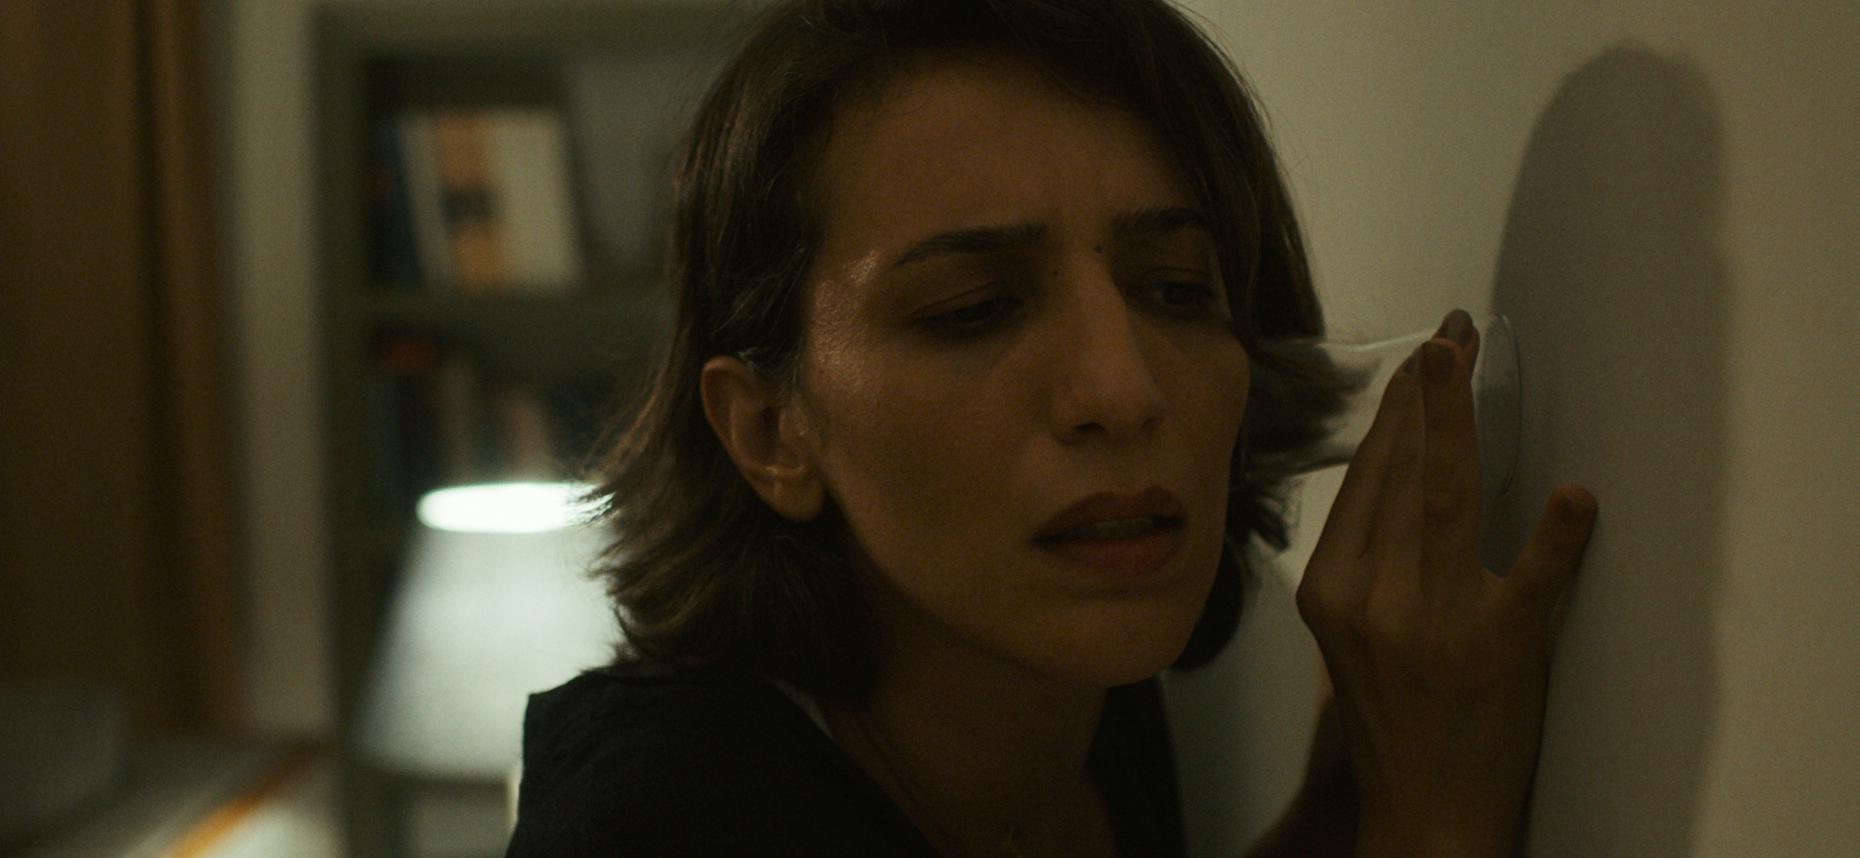 Nazlı Elif Durlu - ZUHAL 01